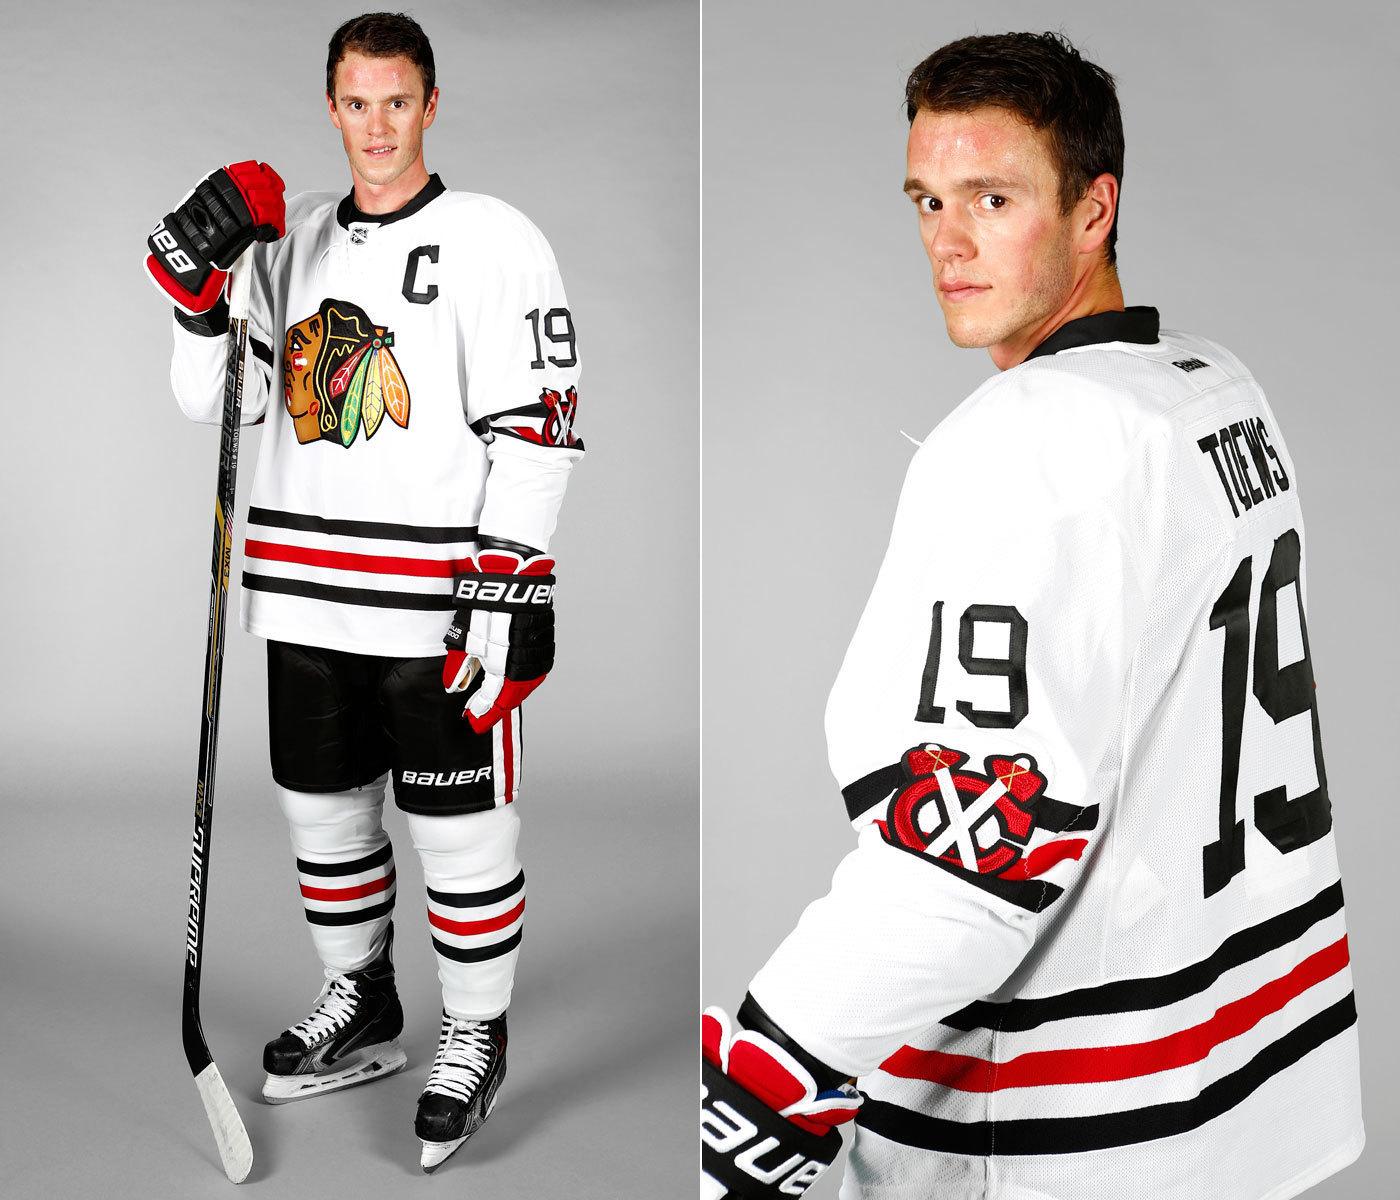 Blackhawks  Winter Classic sweater revealed - Chicago Tribune c91cae1ba